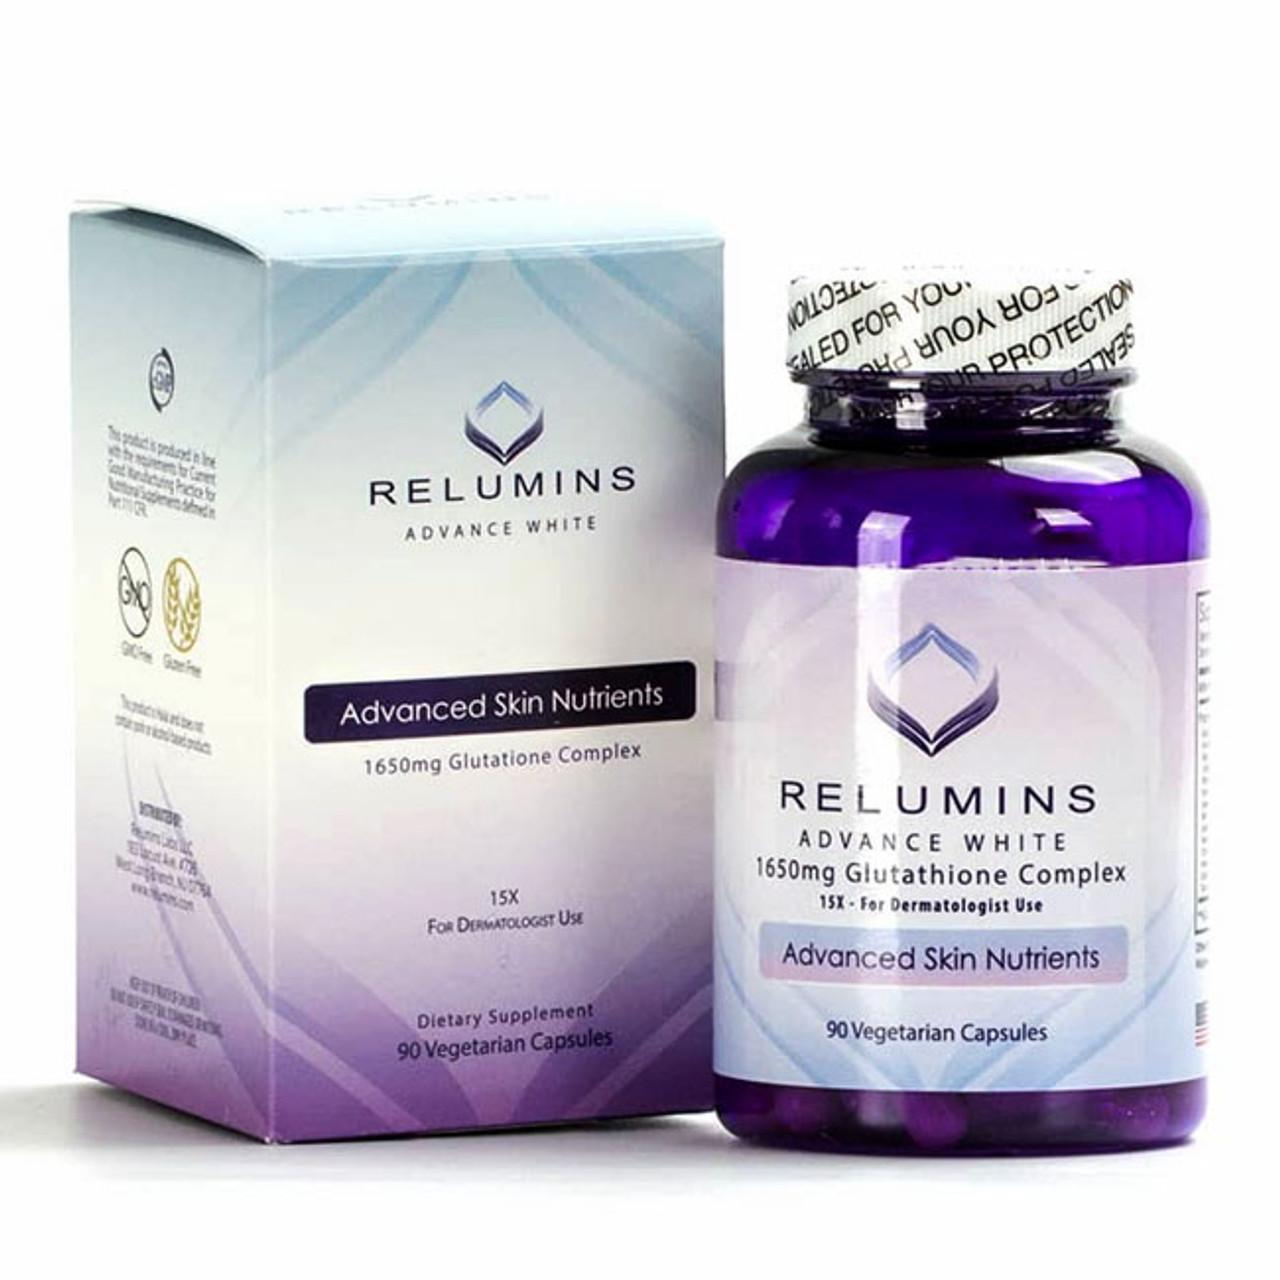 6x RELUMINS ADVANCE WHITE 1650mg Glutathione Complex 15X – for DERMATOLOGIST USE